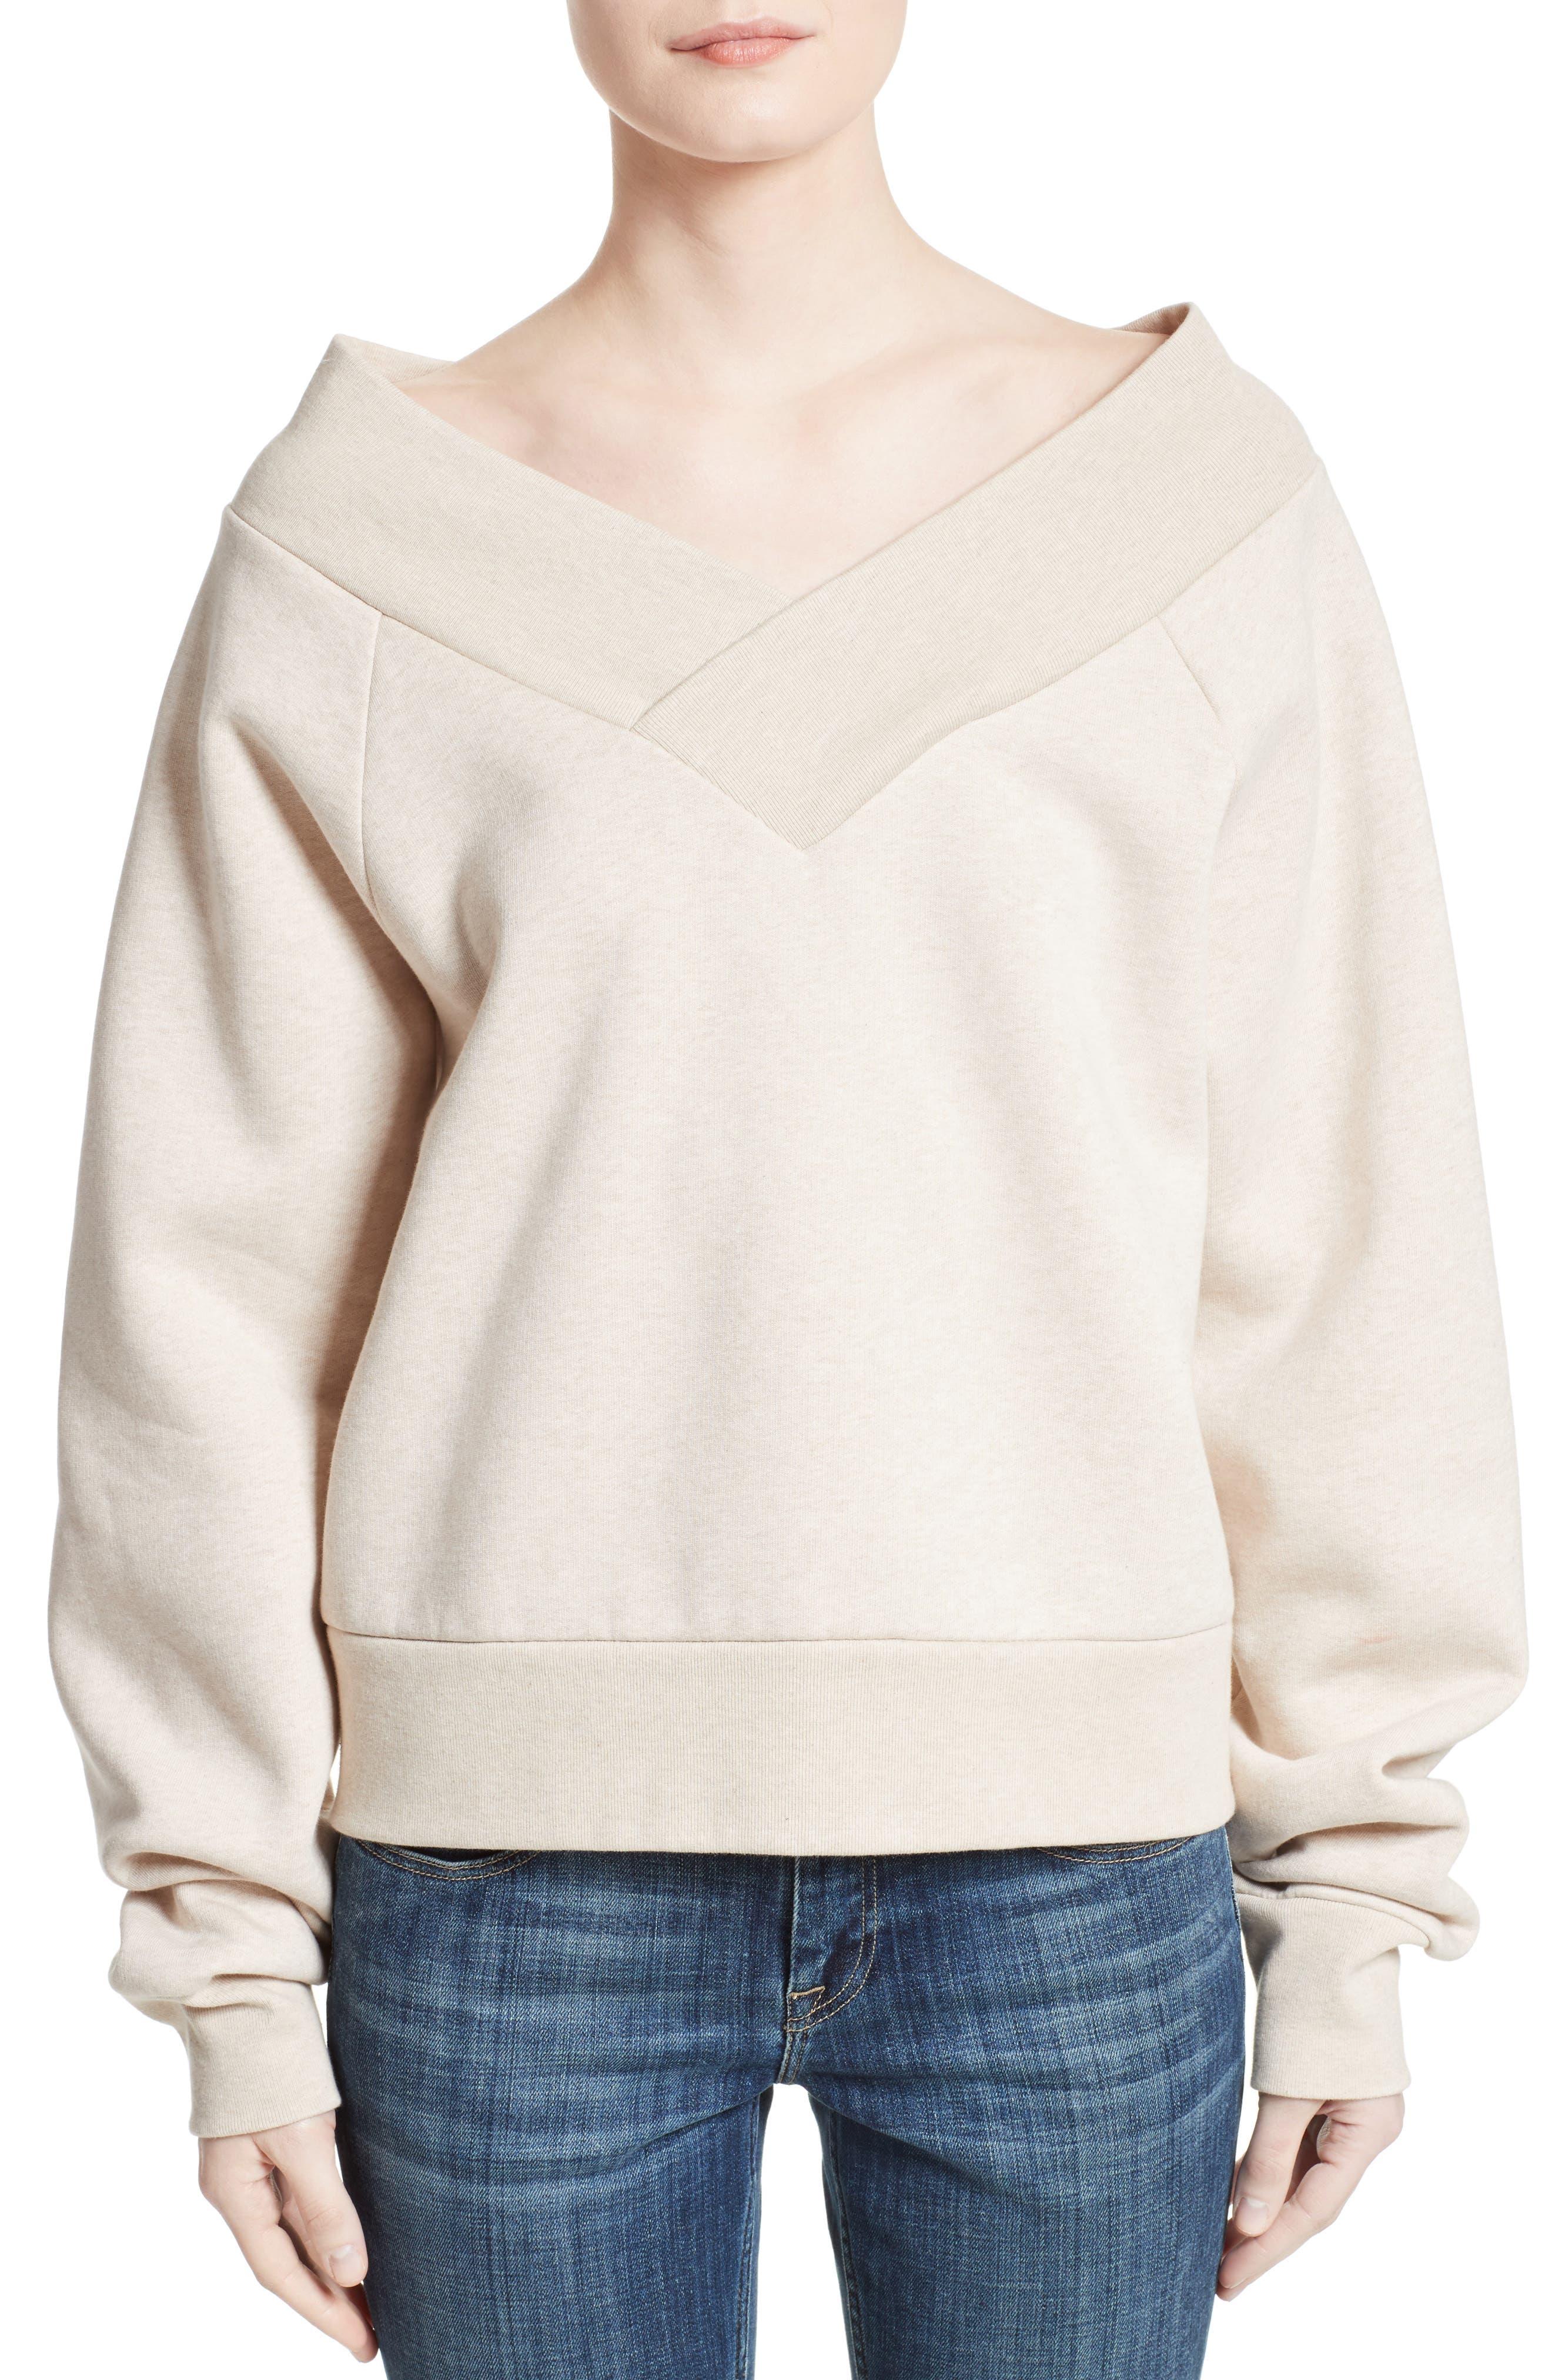 Falacho V-Neck Sweatshirt,                         Main,                         color, 250